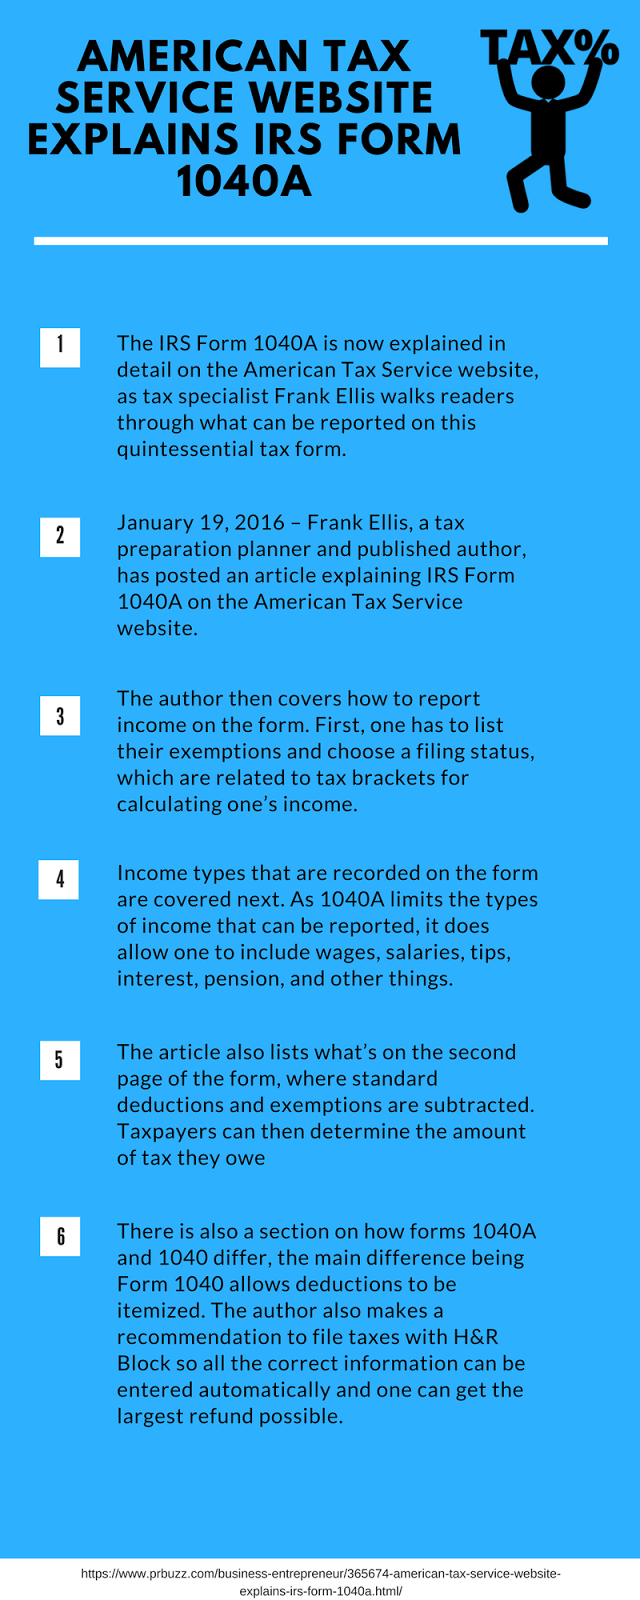 8dad6d21dad https   www.prbuzz.com business-entrepreneur 365674-american-tax-service-website-explains-irs-form-1040a.html